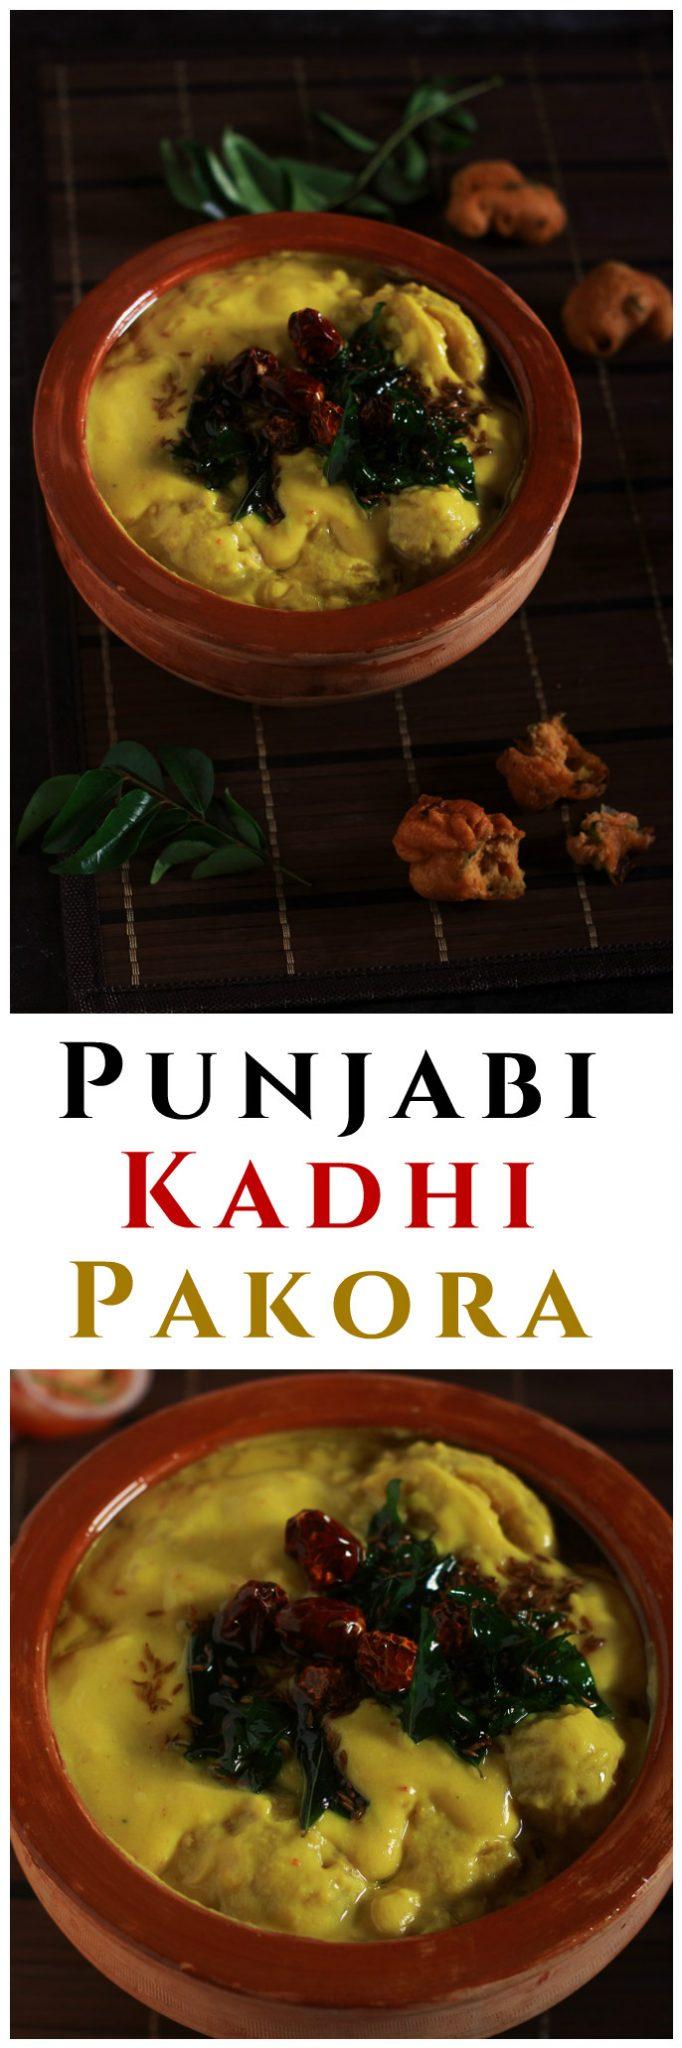 A very scrumptious punjabi kadhi pakora made with gram flour and yogurt. Fried gram flour dumplings are cooked in a yogurt based sauce. #kadhipakora #indianrecipe #halalrecipe #vegrecipe #pakora #kadhi